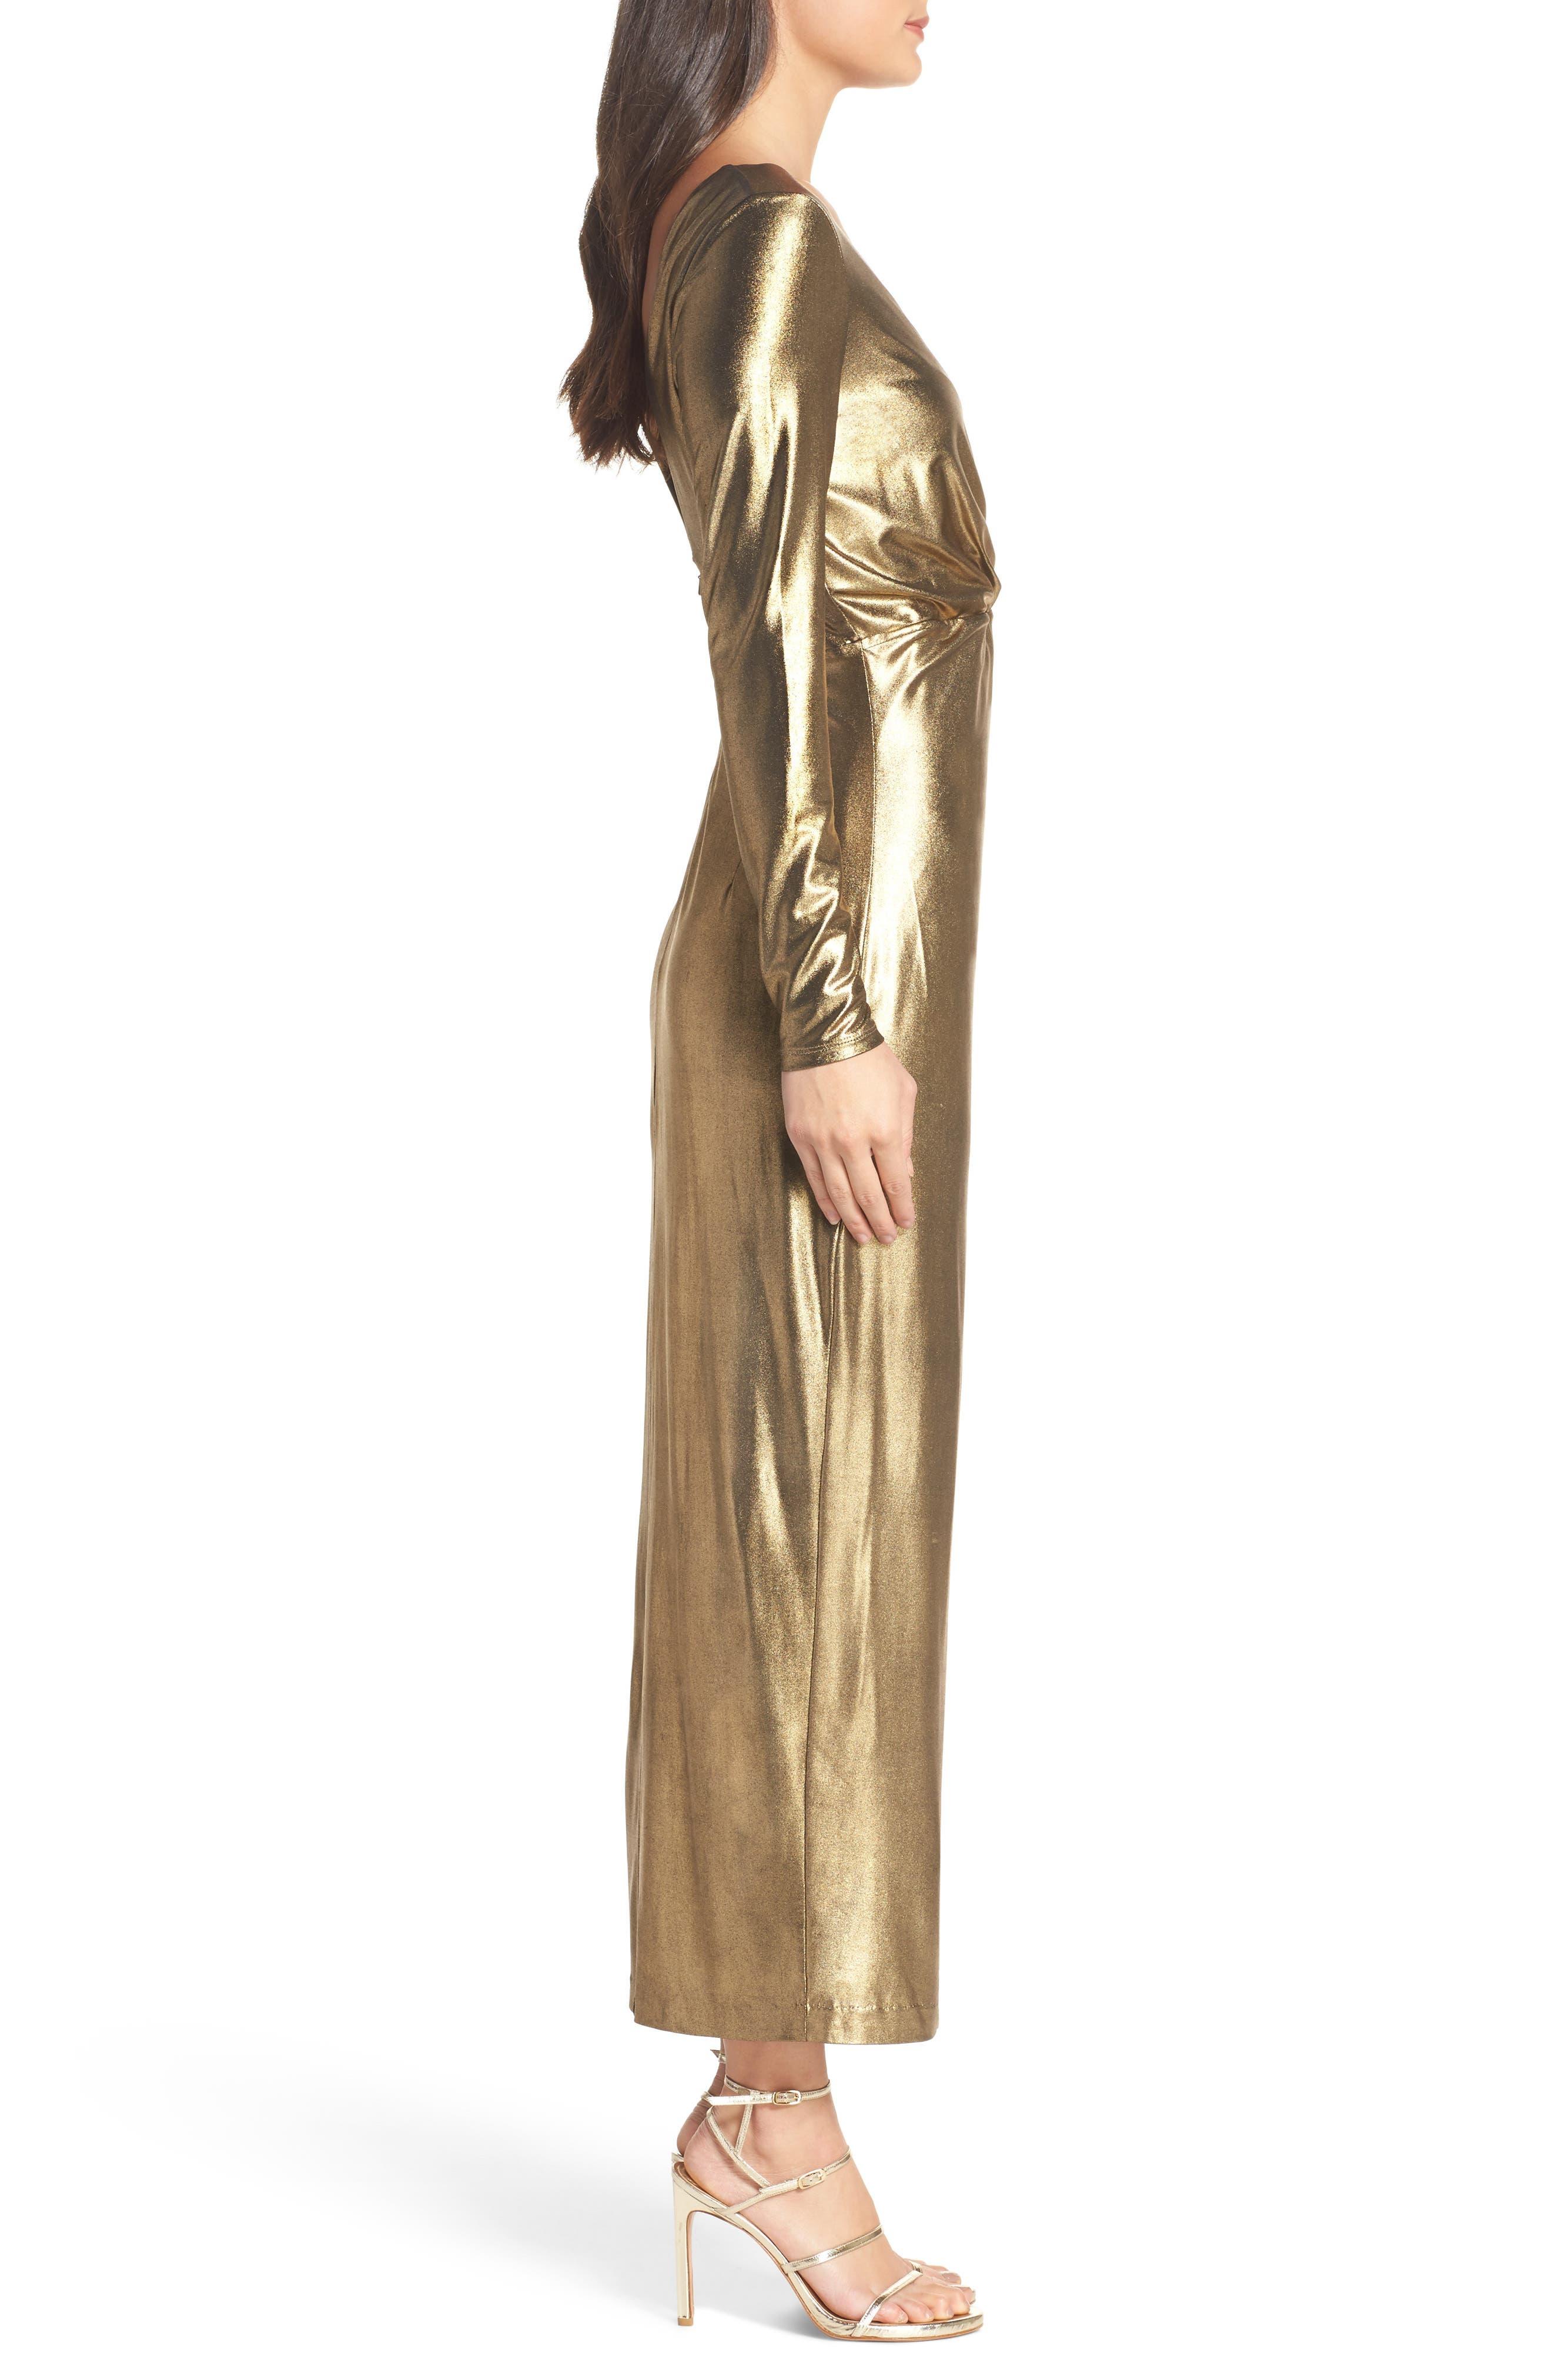 Aurel Metallic Dress,                             Alternate thumbnail 3, color,